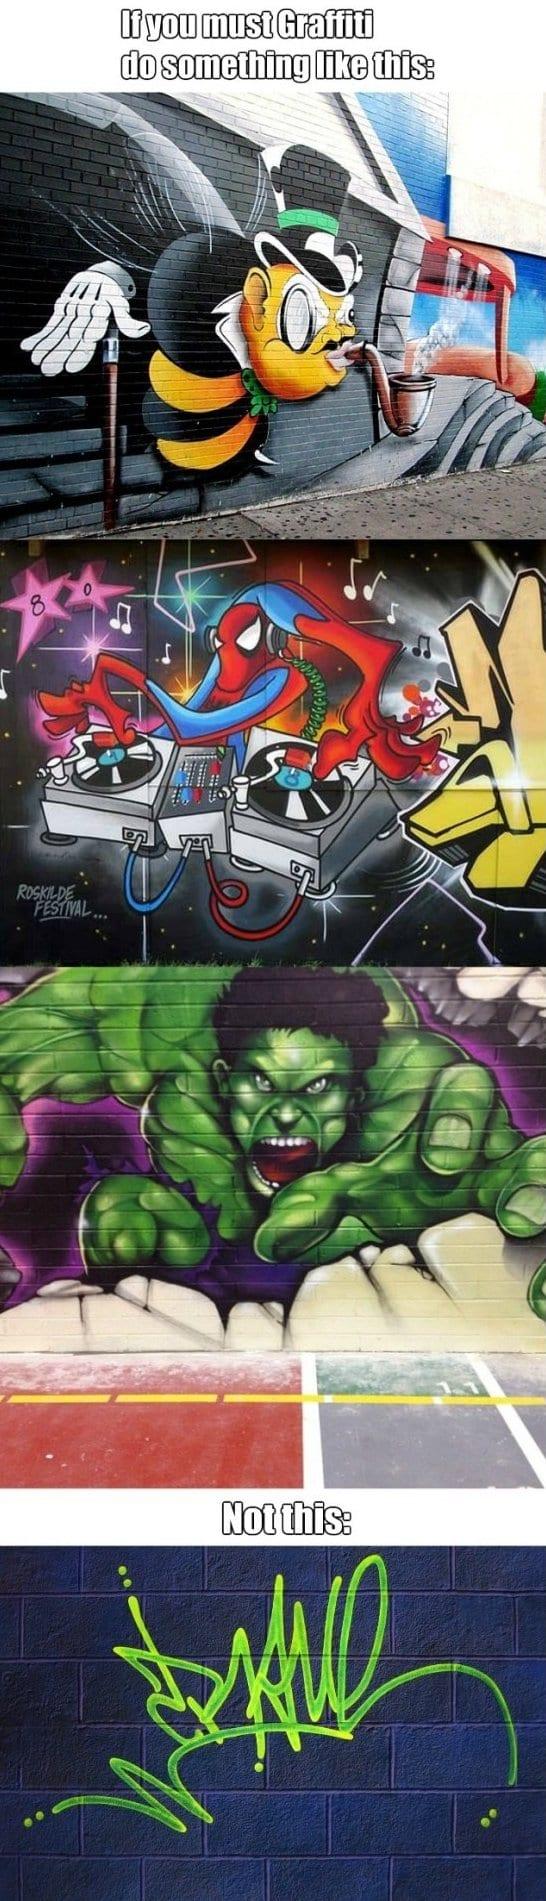 funny-meme-best-lol-awesome-graffiti-vs-bad-graffiti